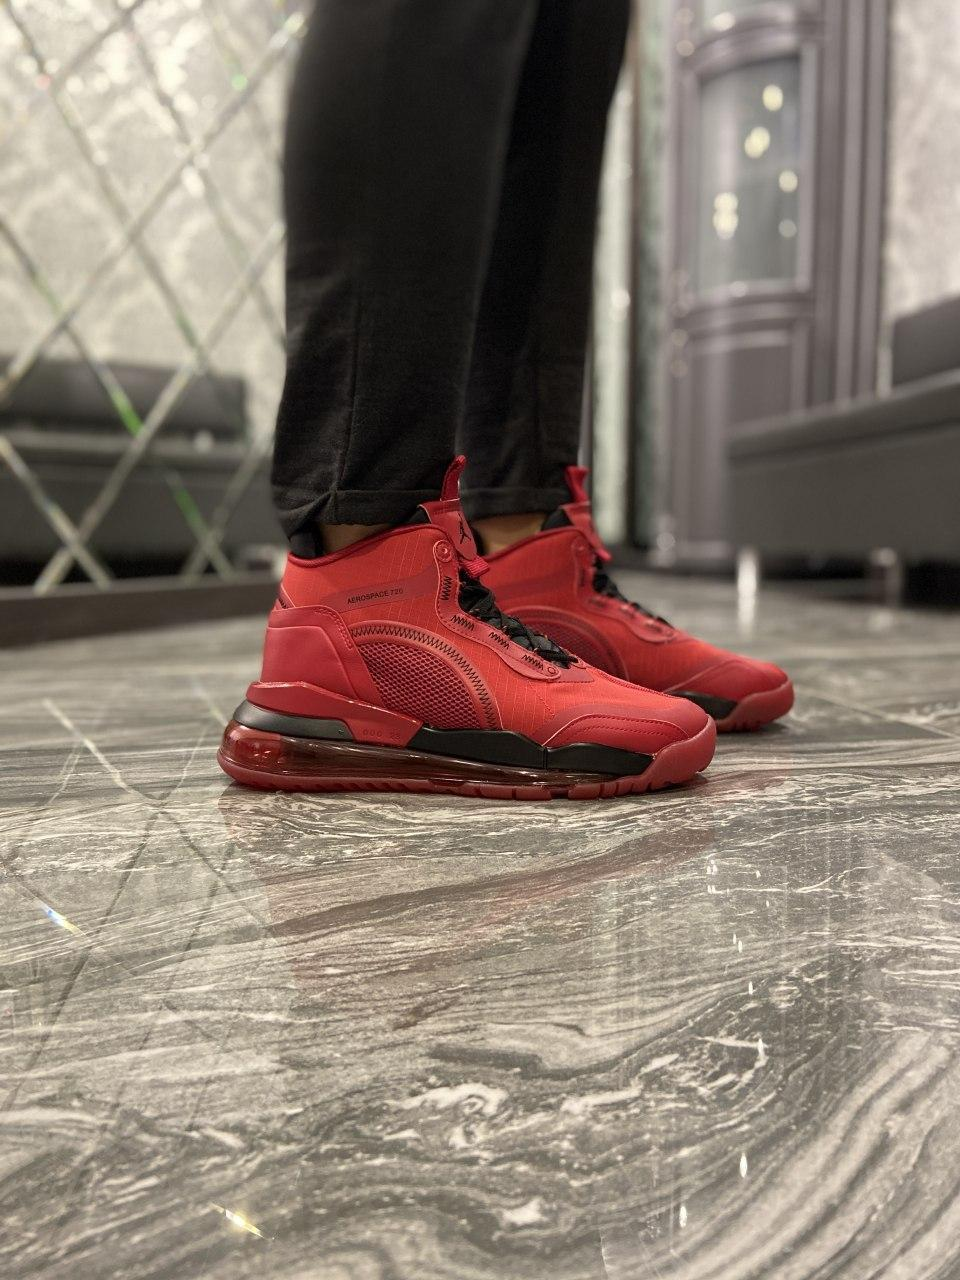 Кроссовки Nike Jordan Air Space 720 Red Black Кроссовки Найк Аир Джордан